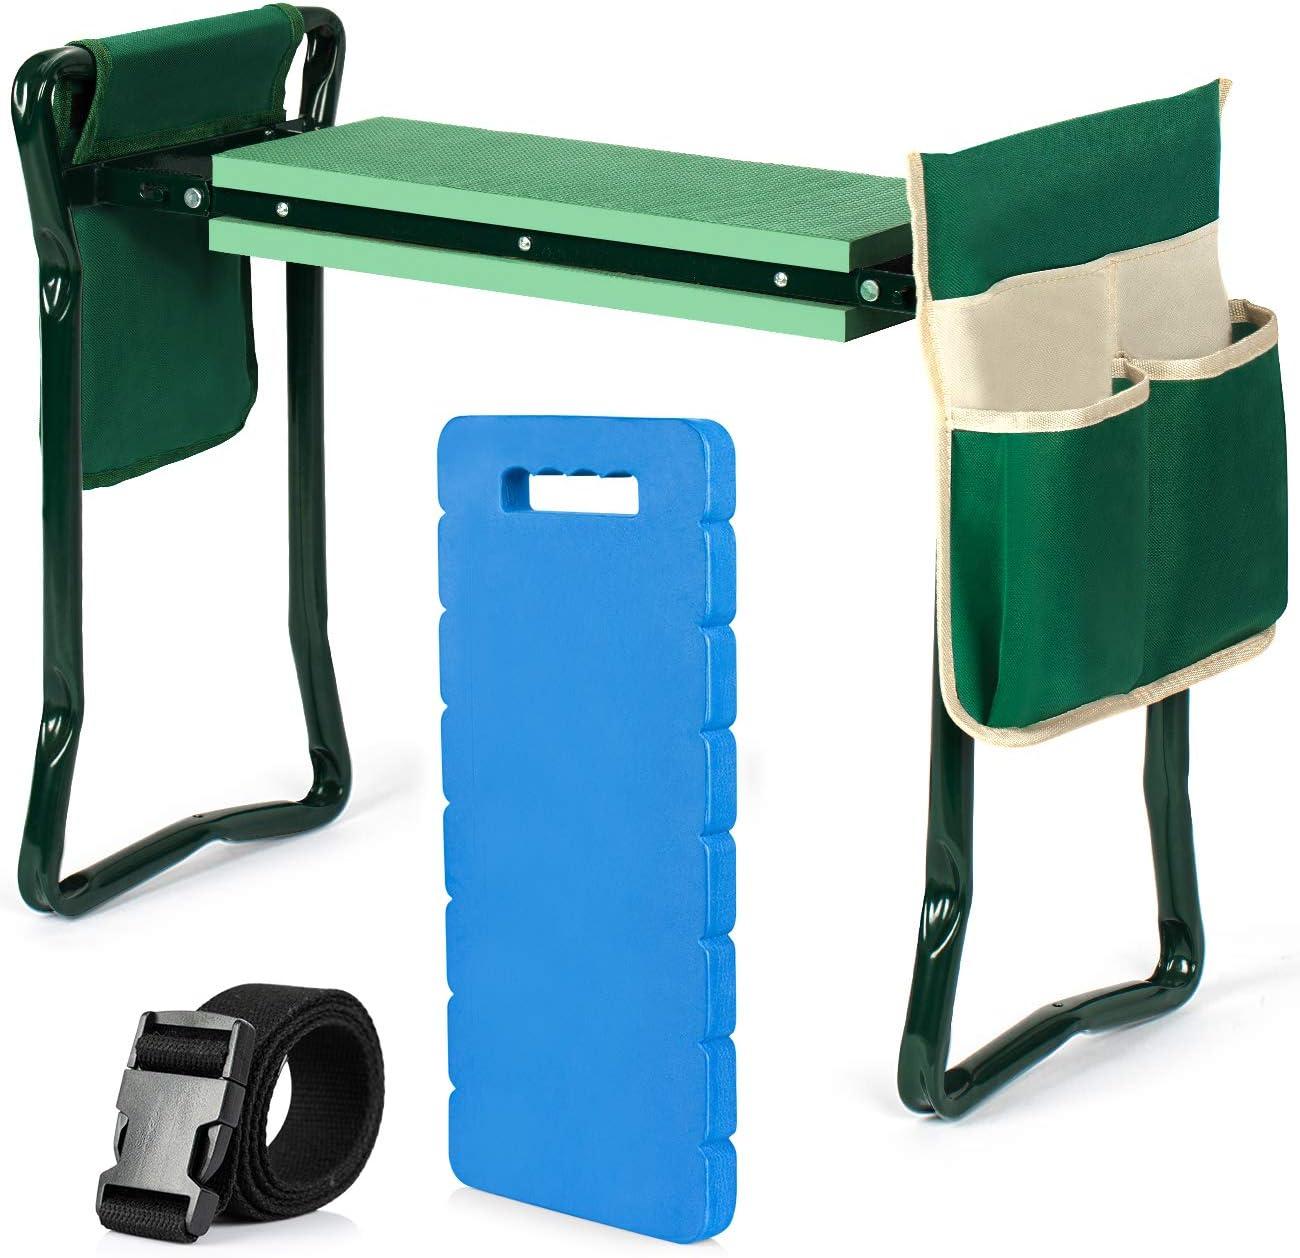 COSYLAND Garden Kneeler and Seat Foldable Soft Gardening Stool with Bonus EVA Kneeling Pad, 2 Pouches and Detachable Belt, Portable Kneeler Workseat for Gardening